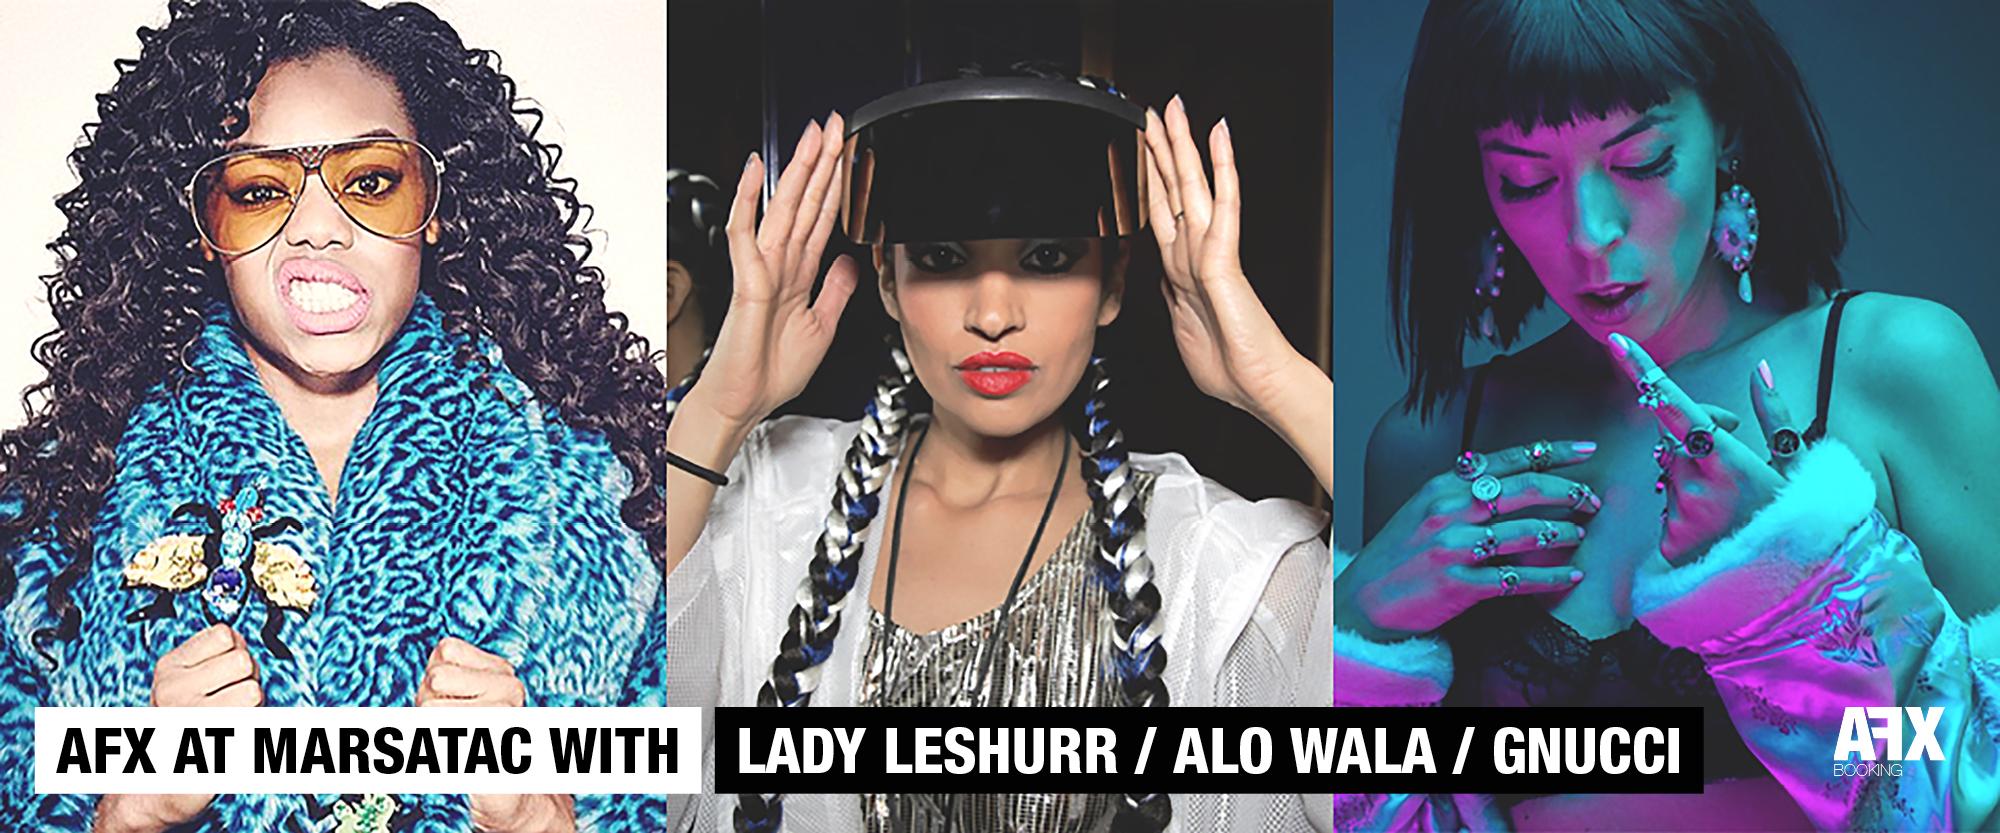 AFX @ MARSATAC AVEC : LADY LESHURR / ALO WALA / GNUCCI